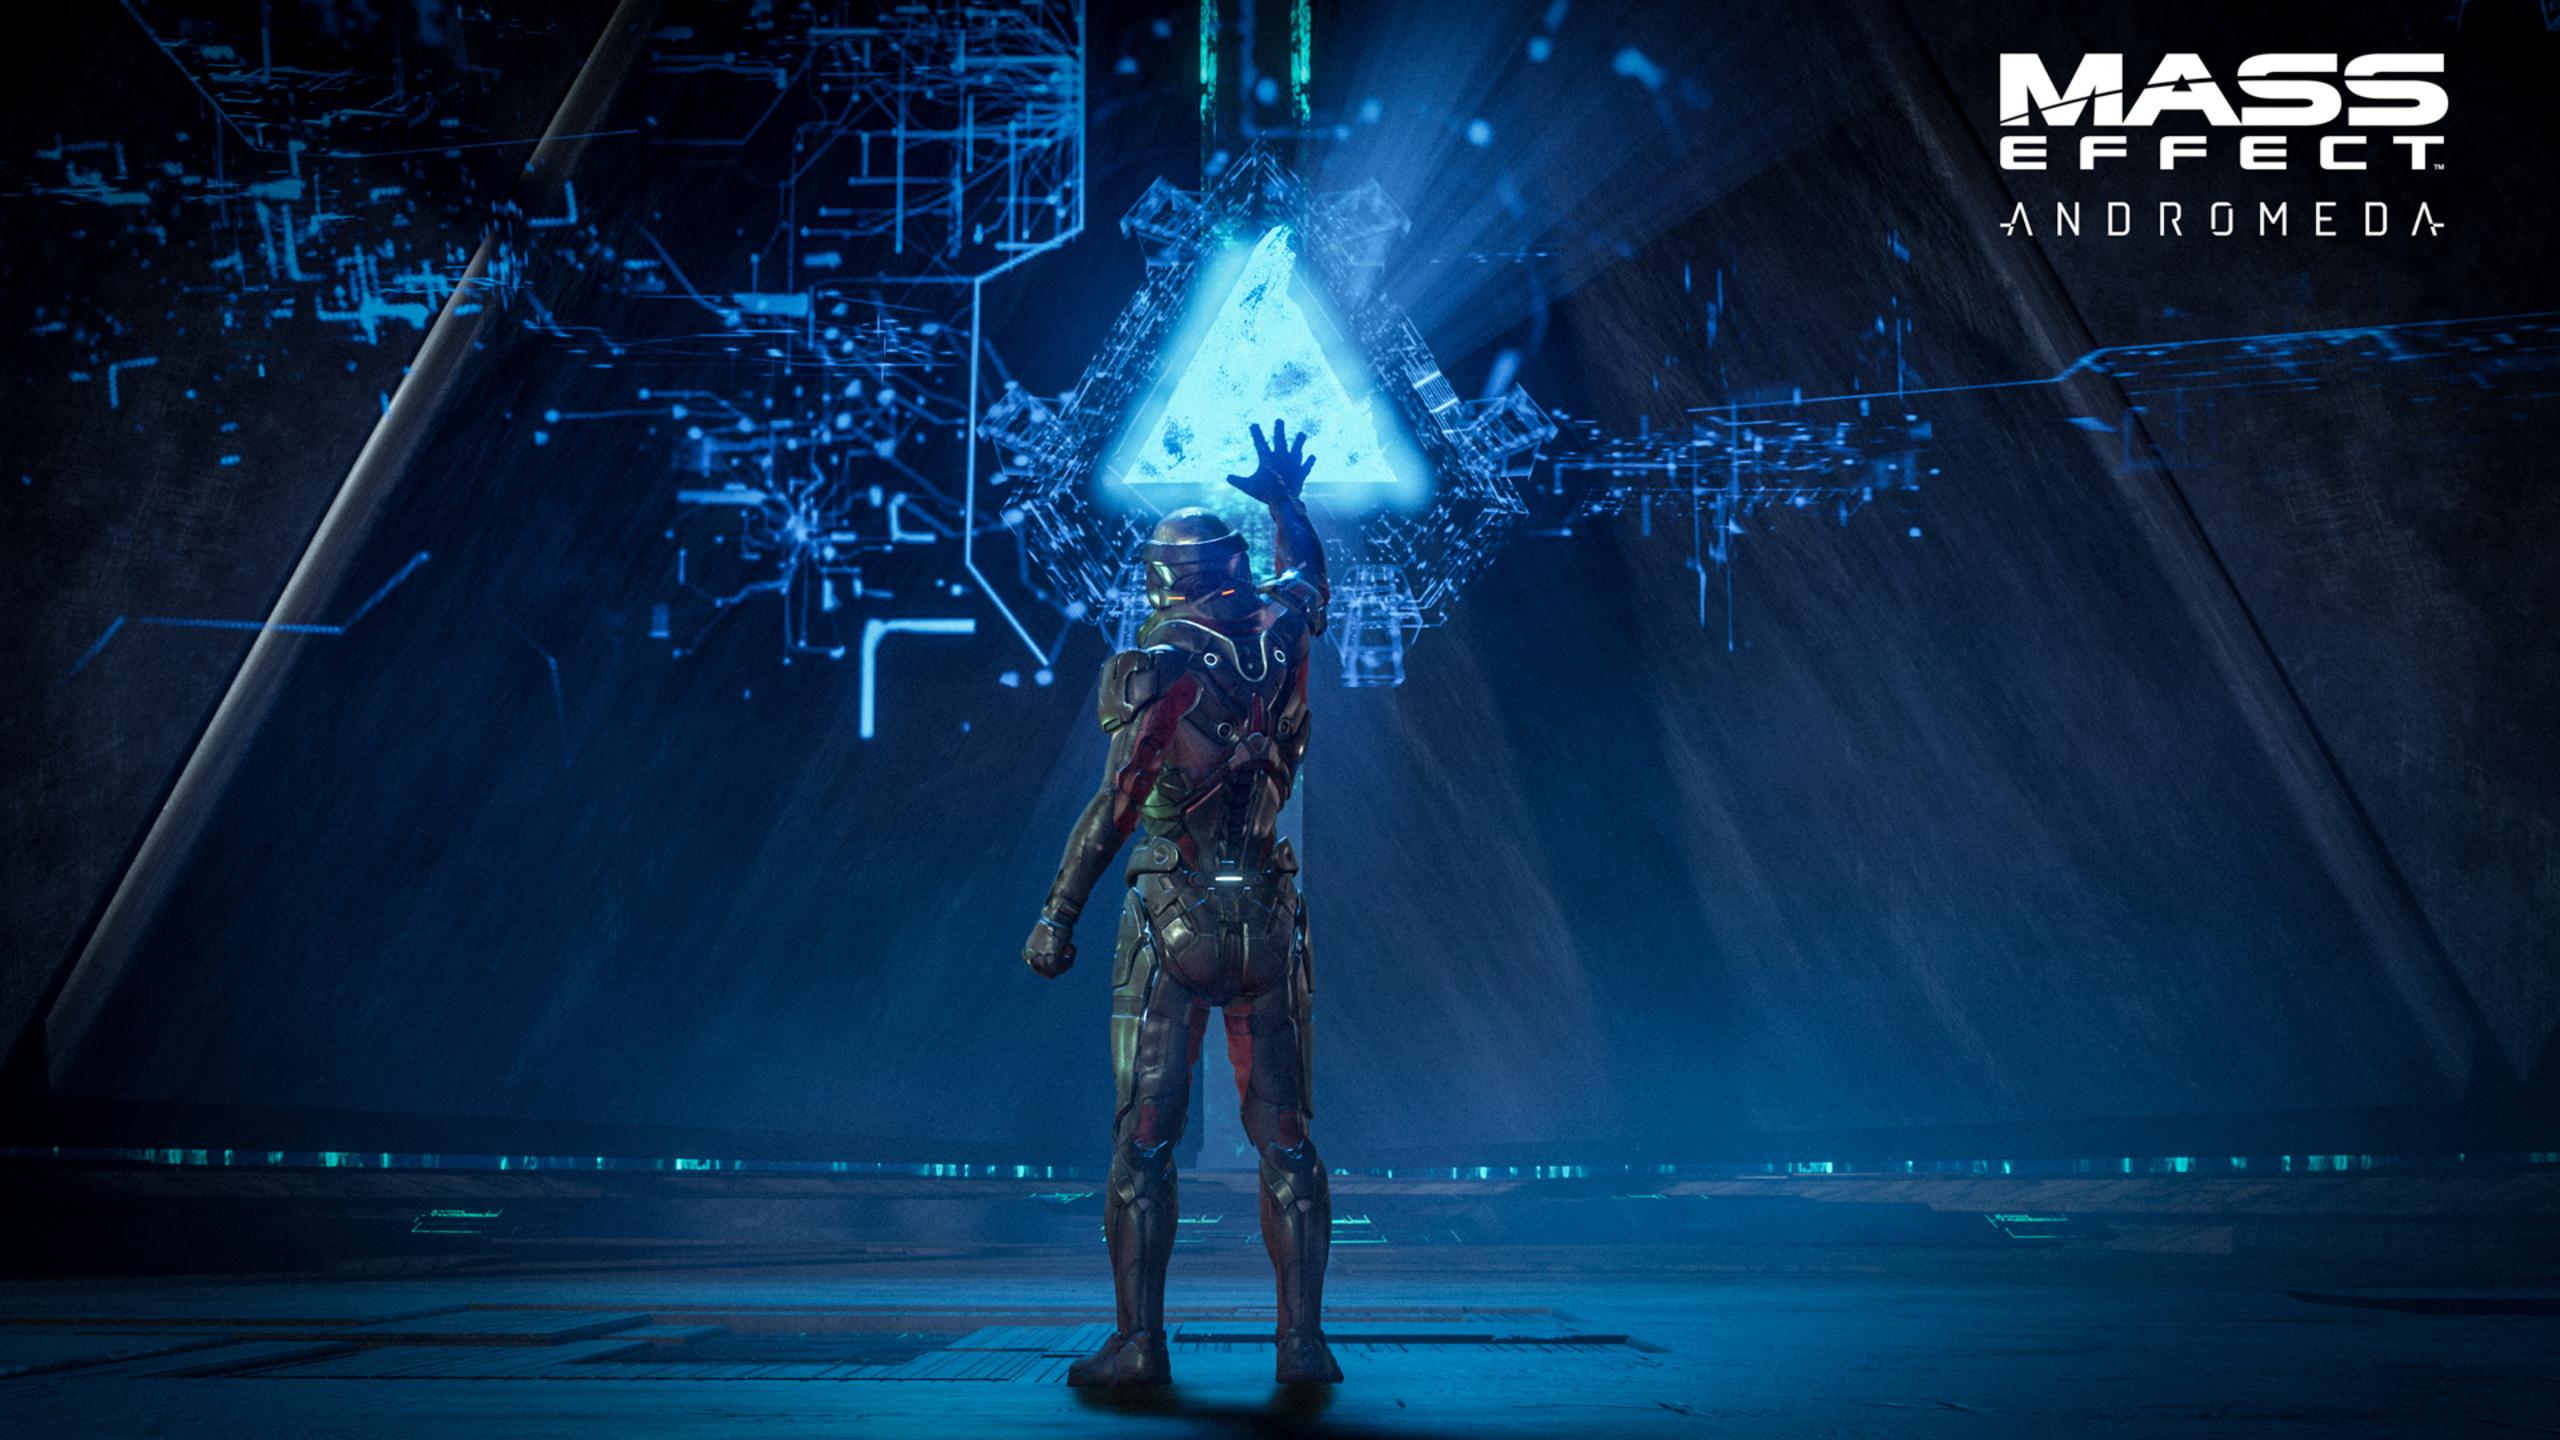 2560x1440 Mass Effect Andromeda HD 2 1440P Resolution HD